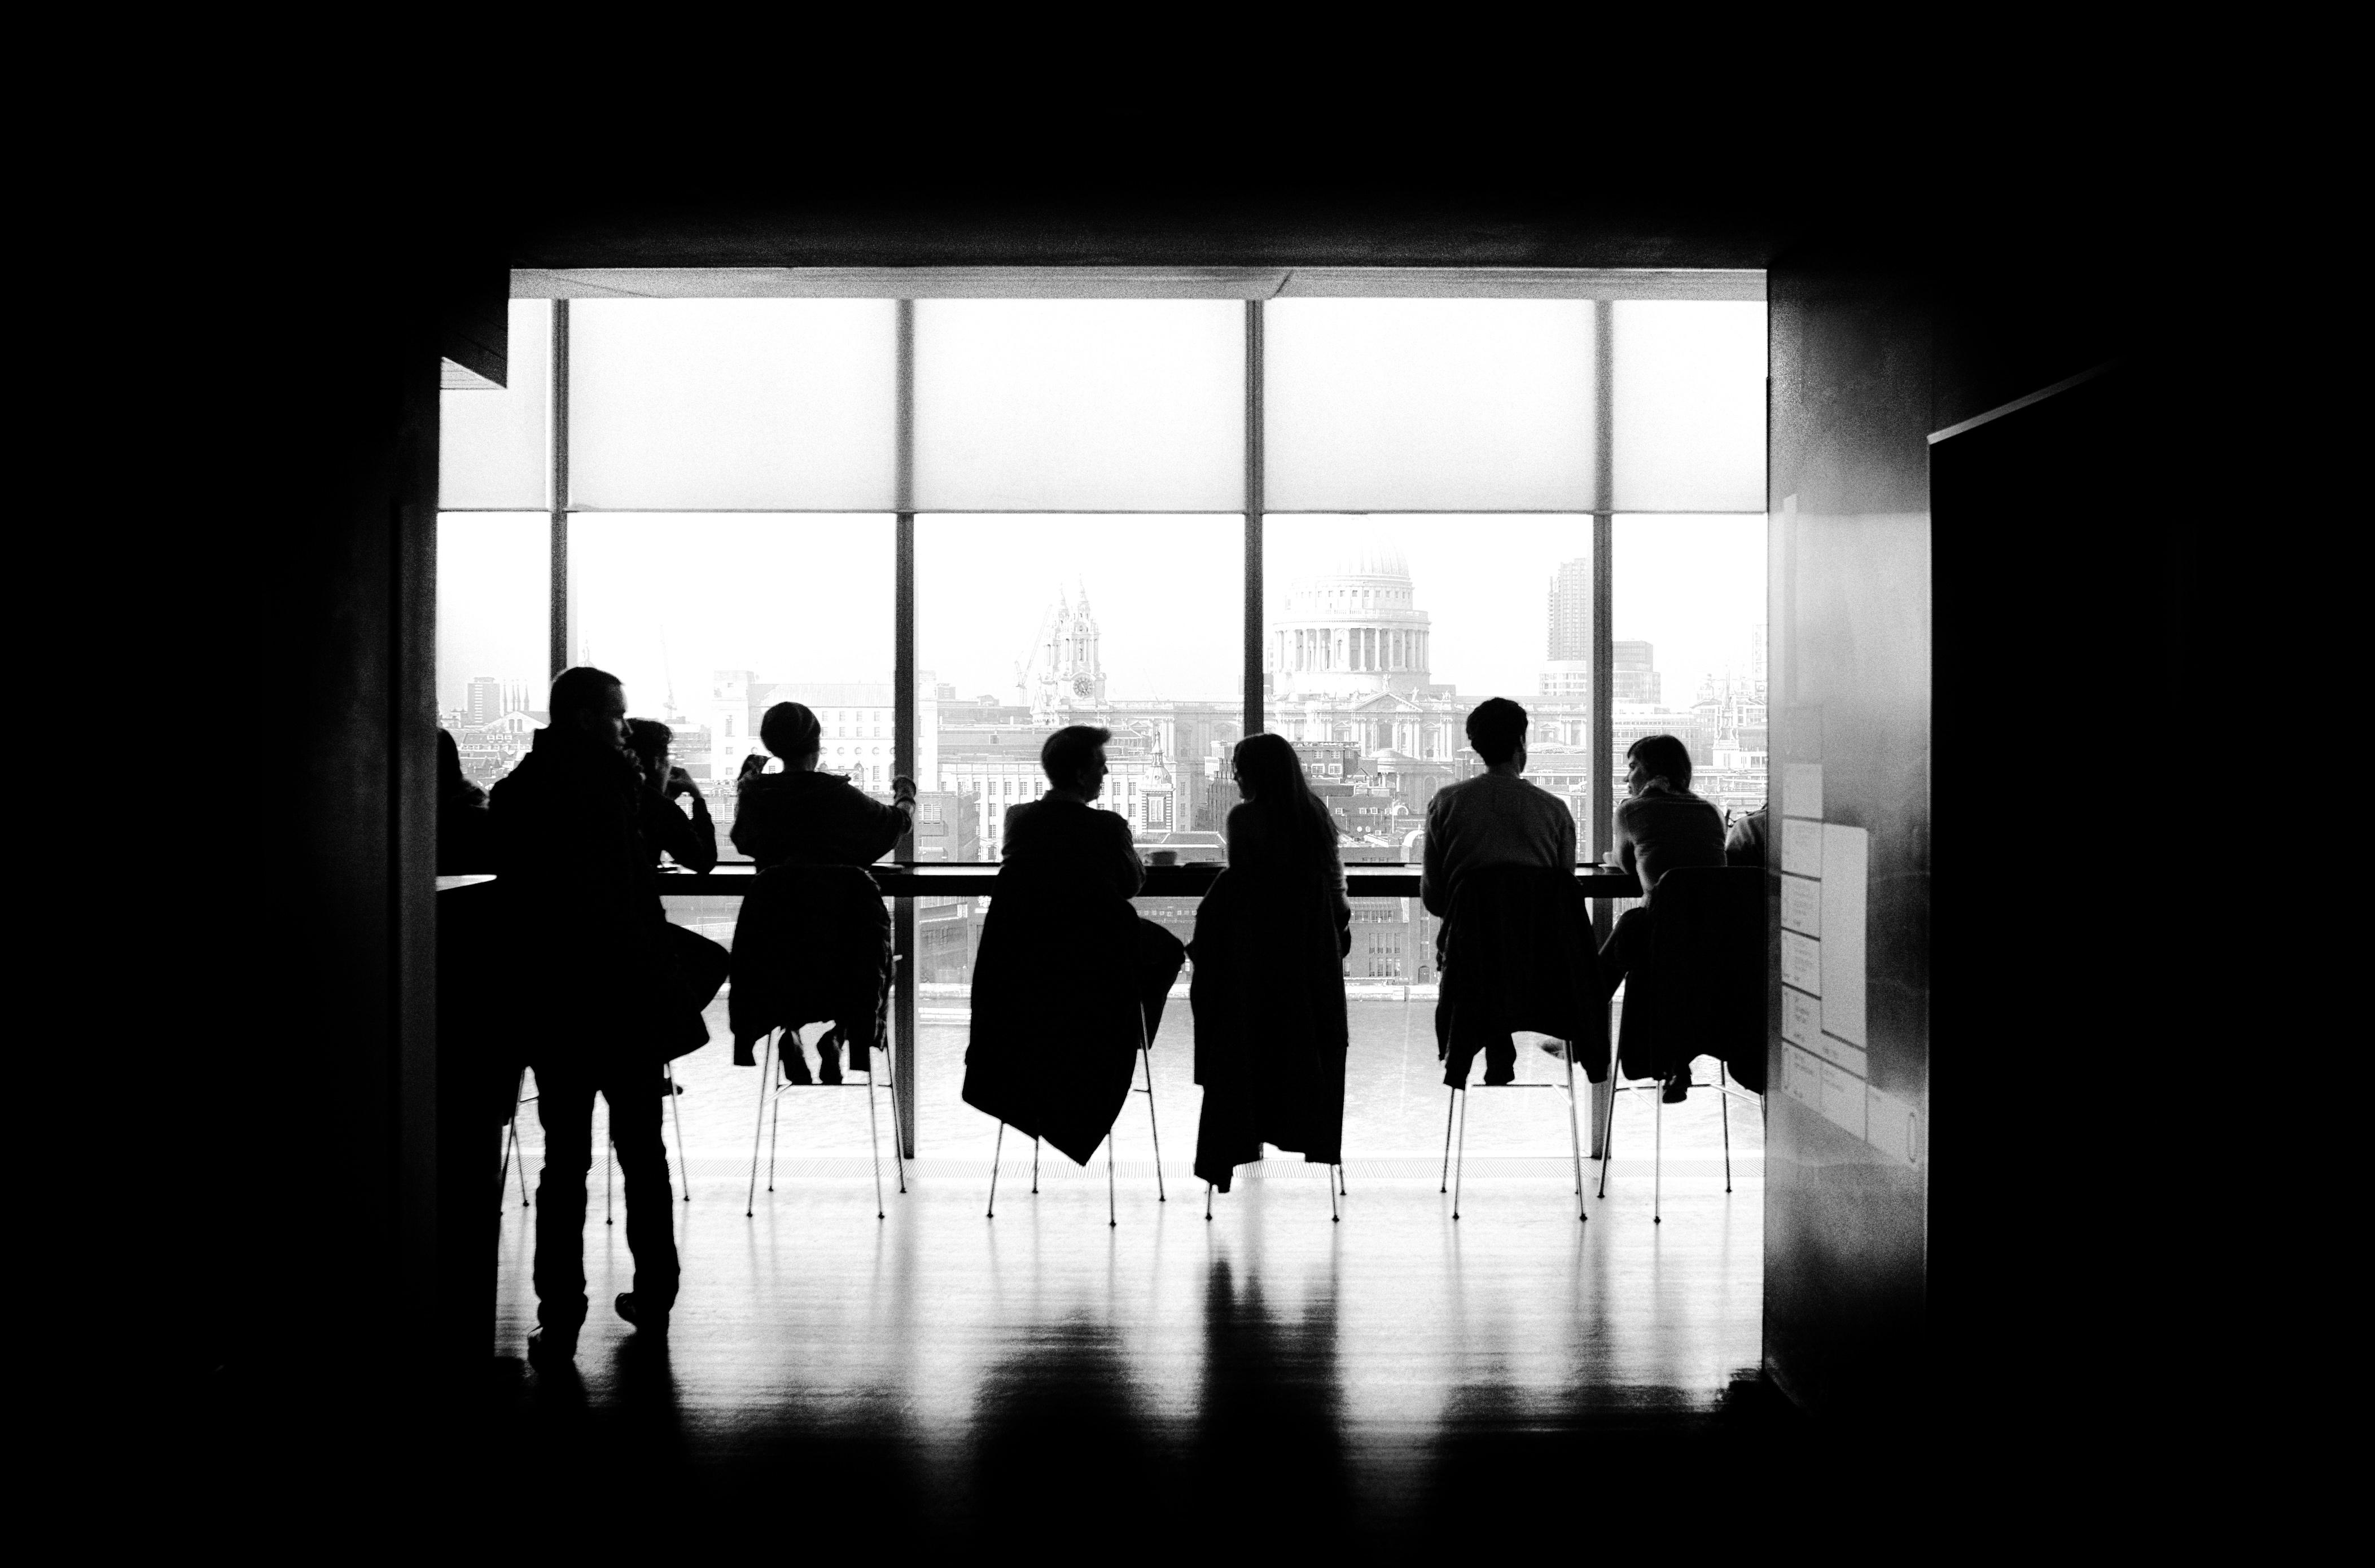 Company meeting silhohette pexels-photo-507020.jpeg